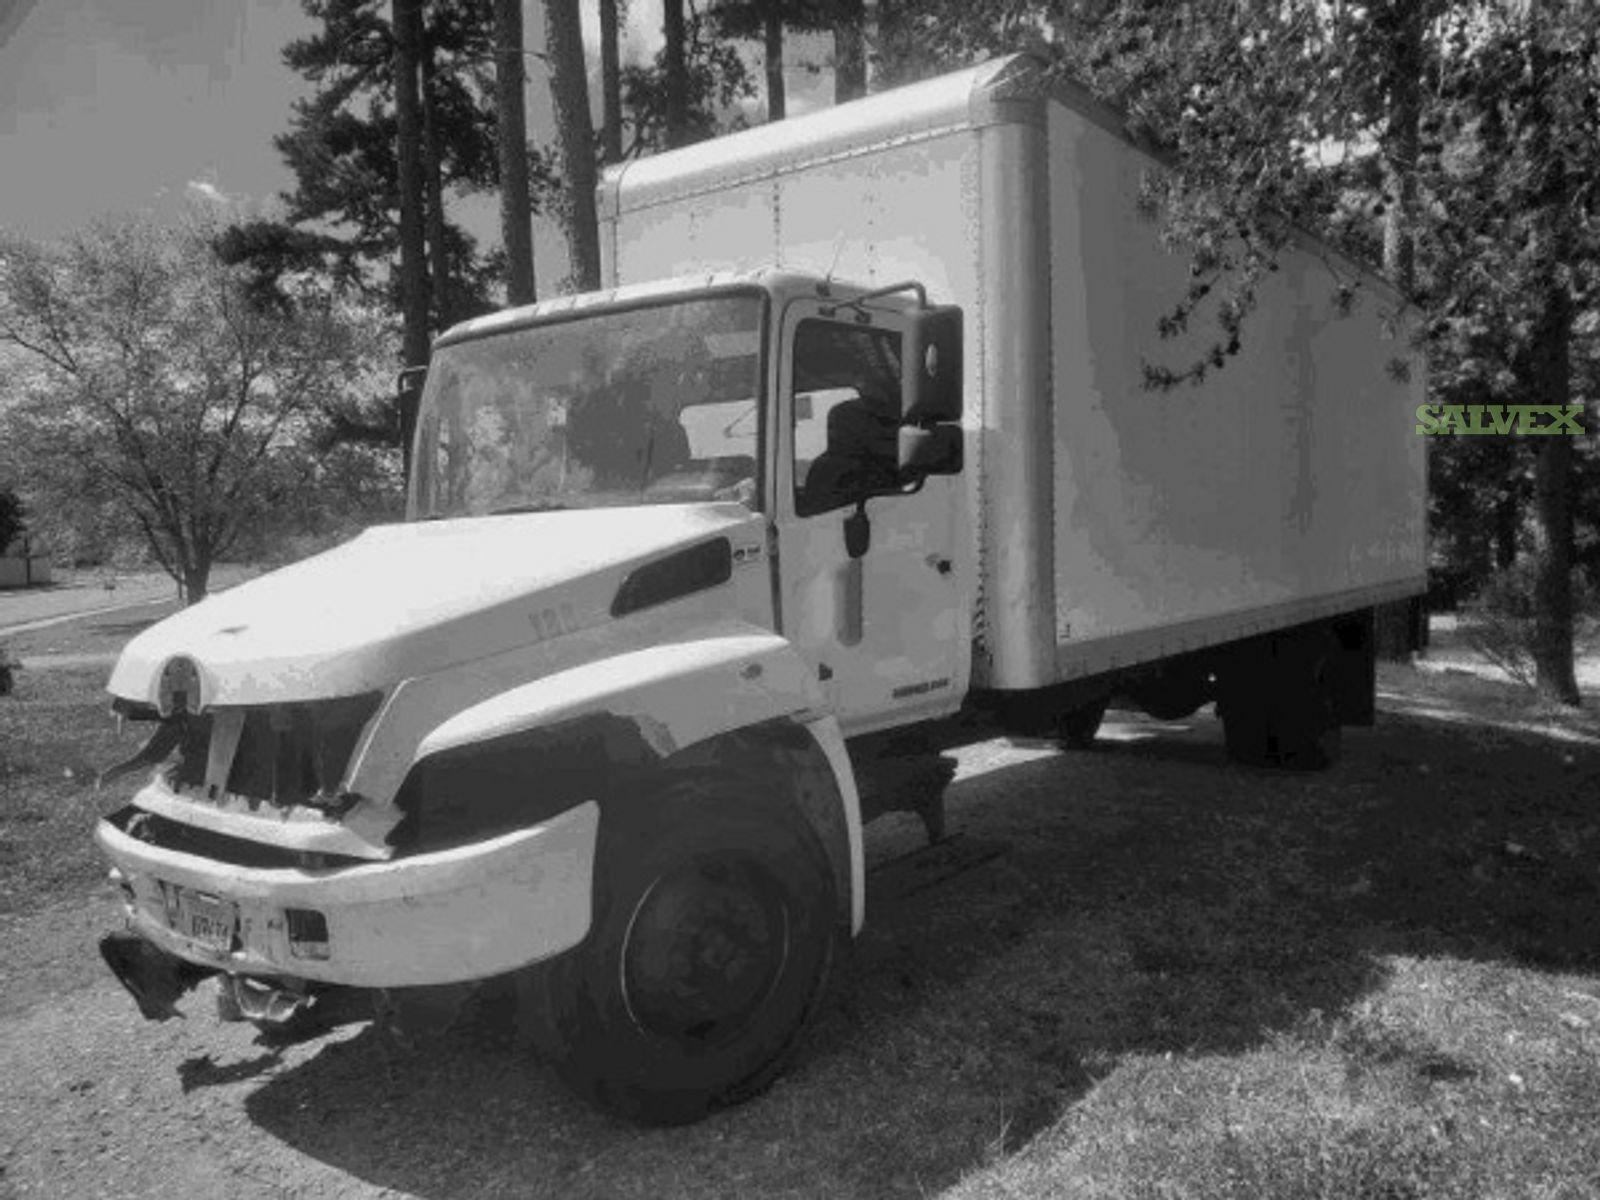 Hino 268 Conventional Cab 2010 (1 Unit)